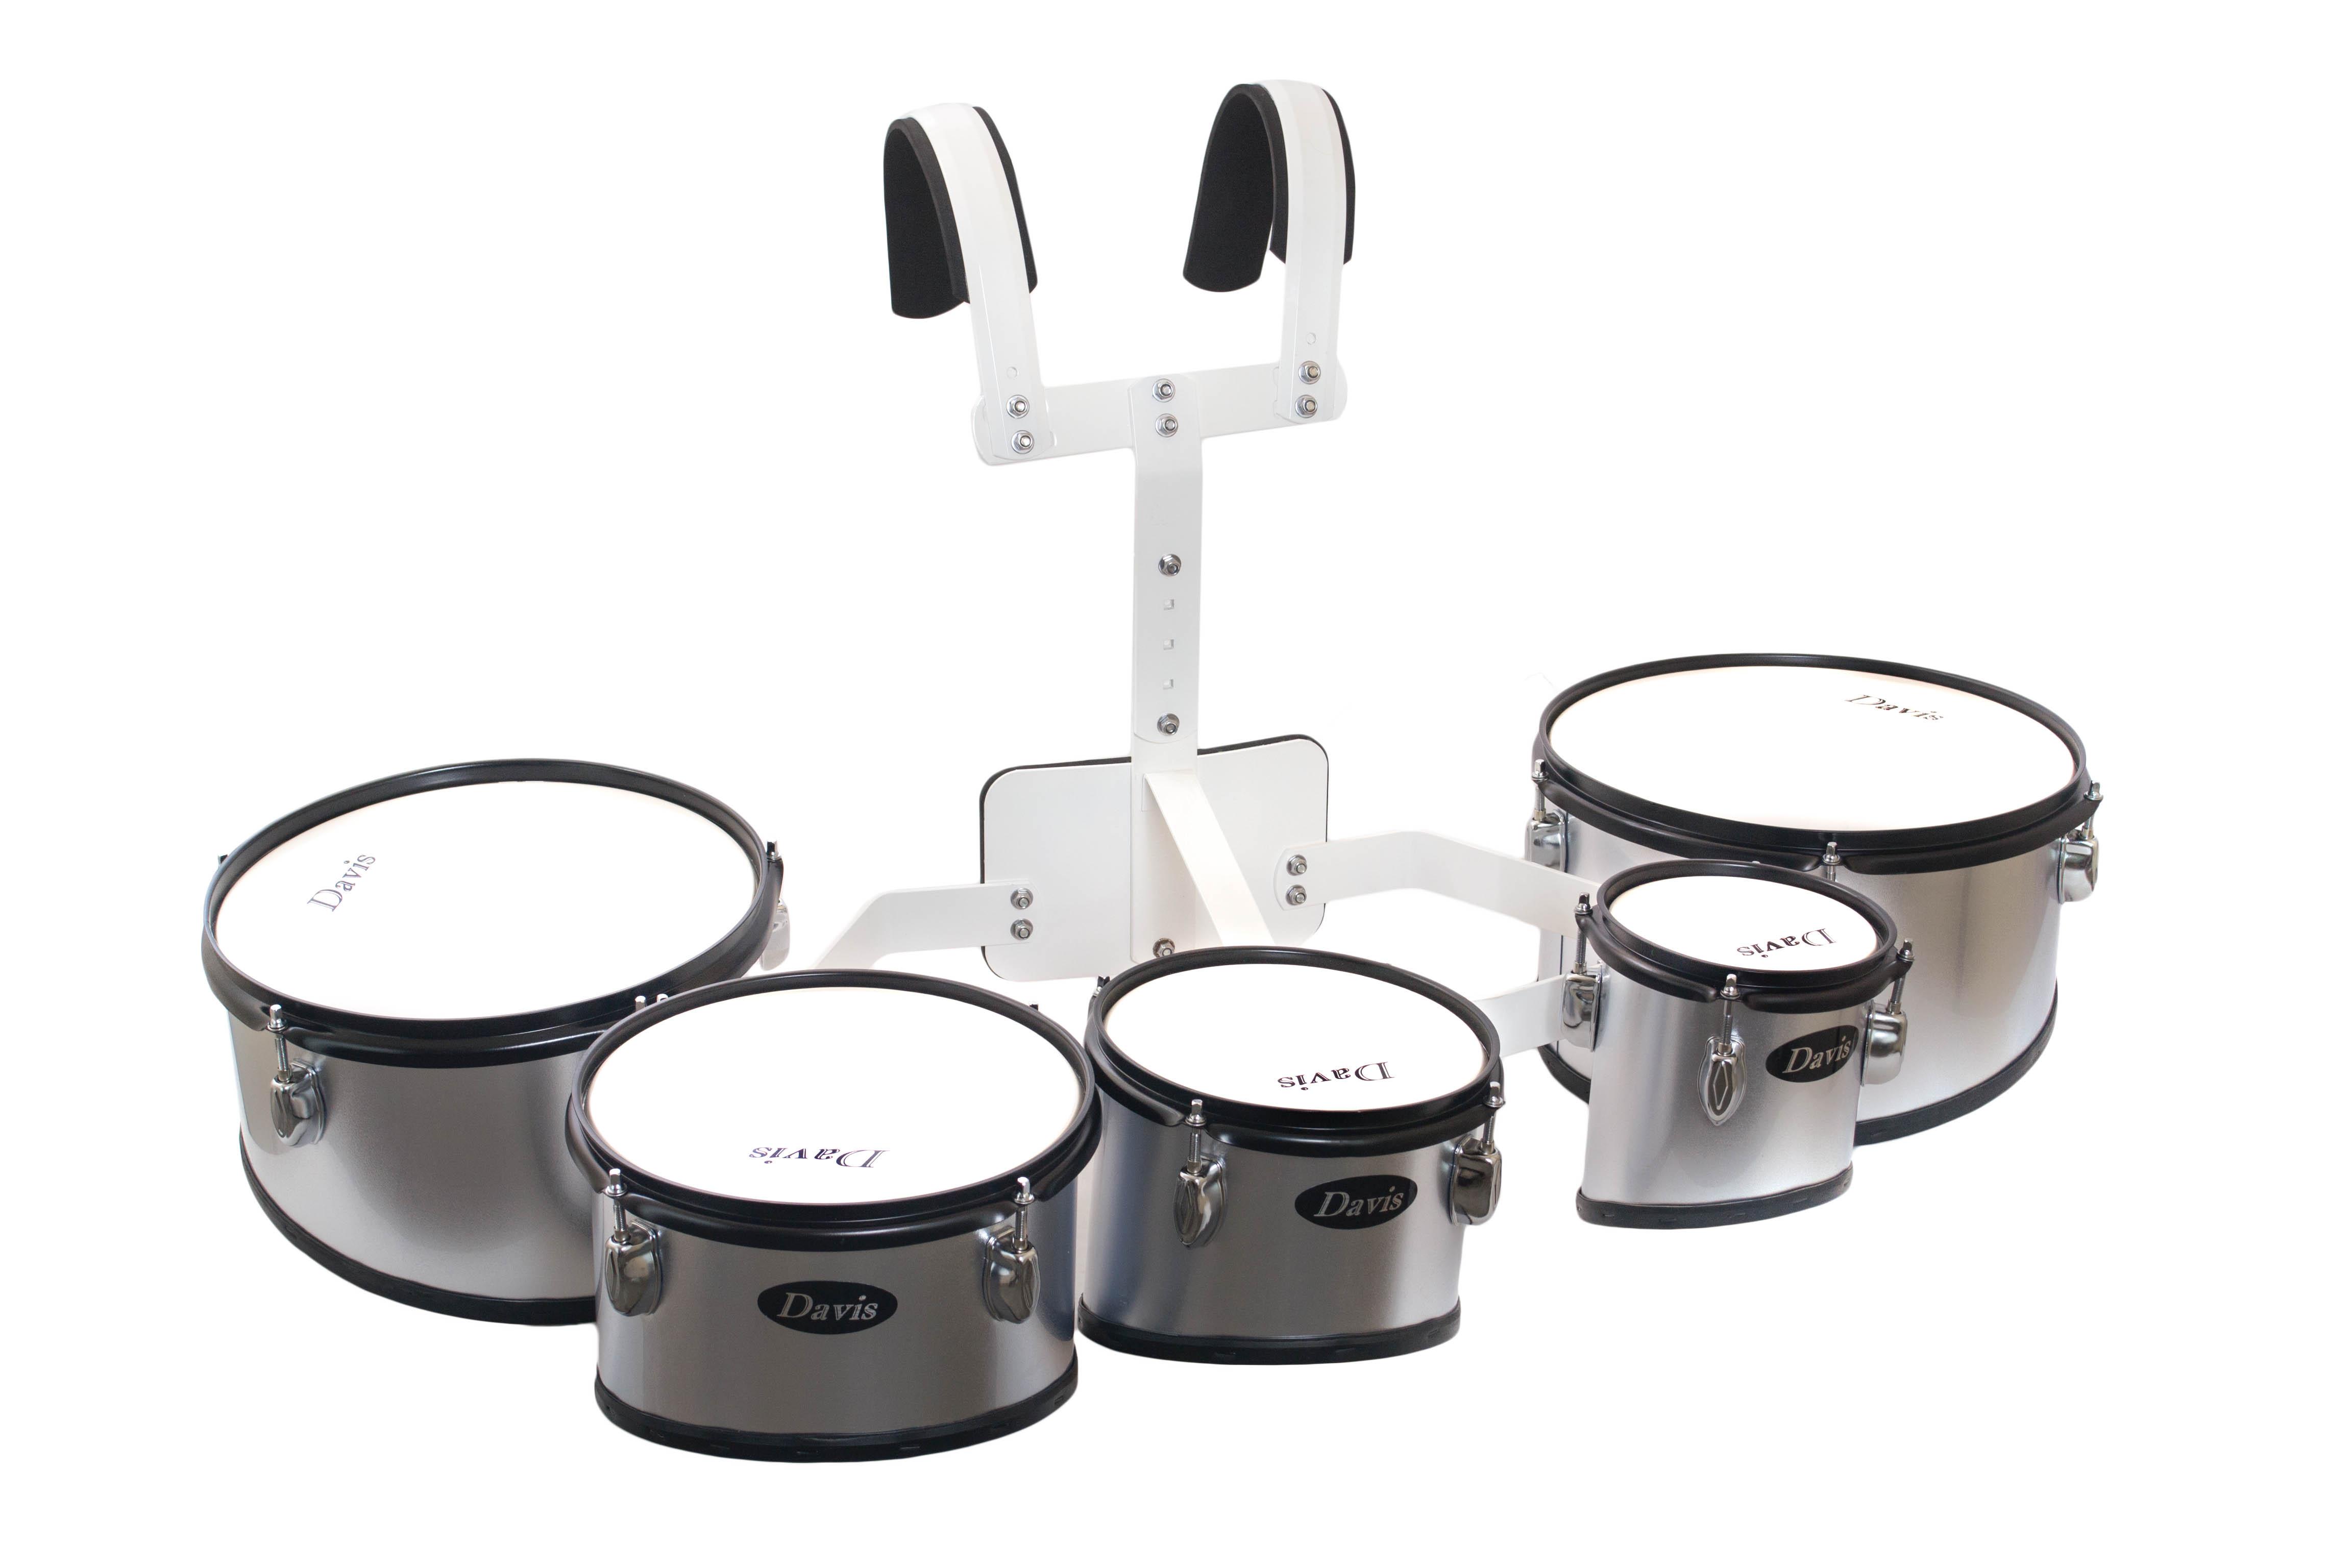 Davis Musical Instruments-Penta 6,8,10,12,13-S_0